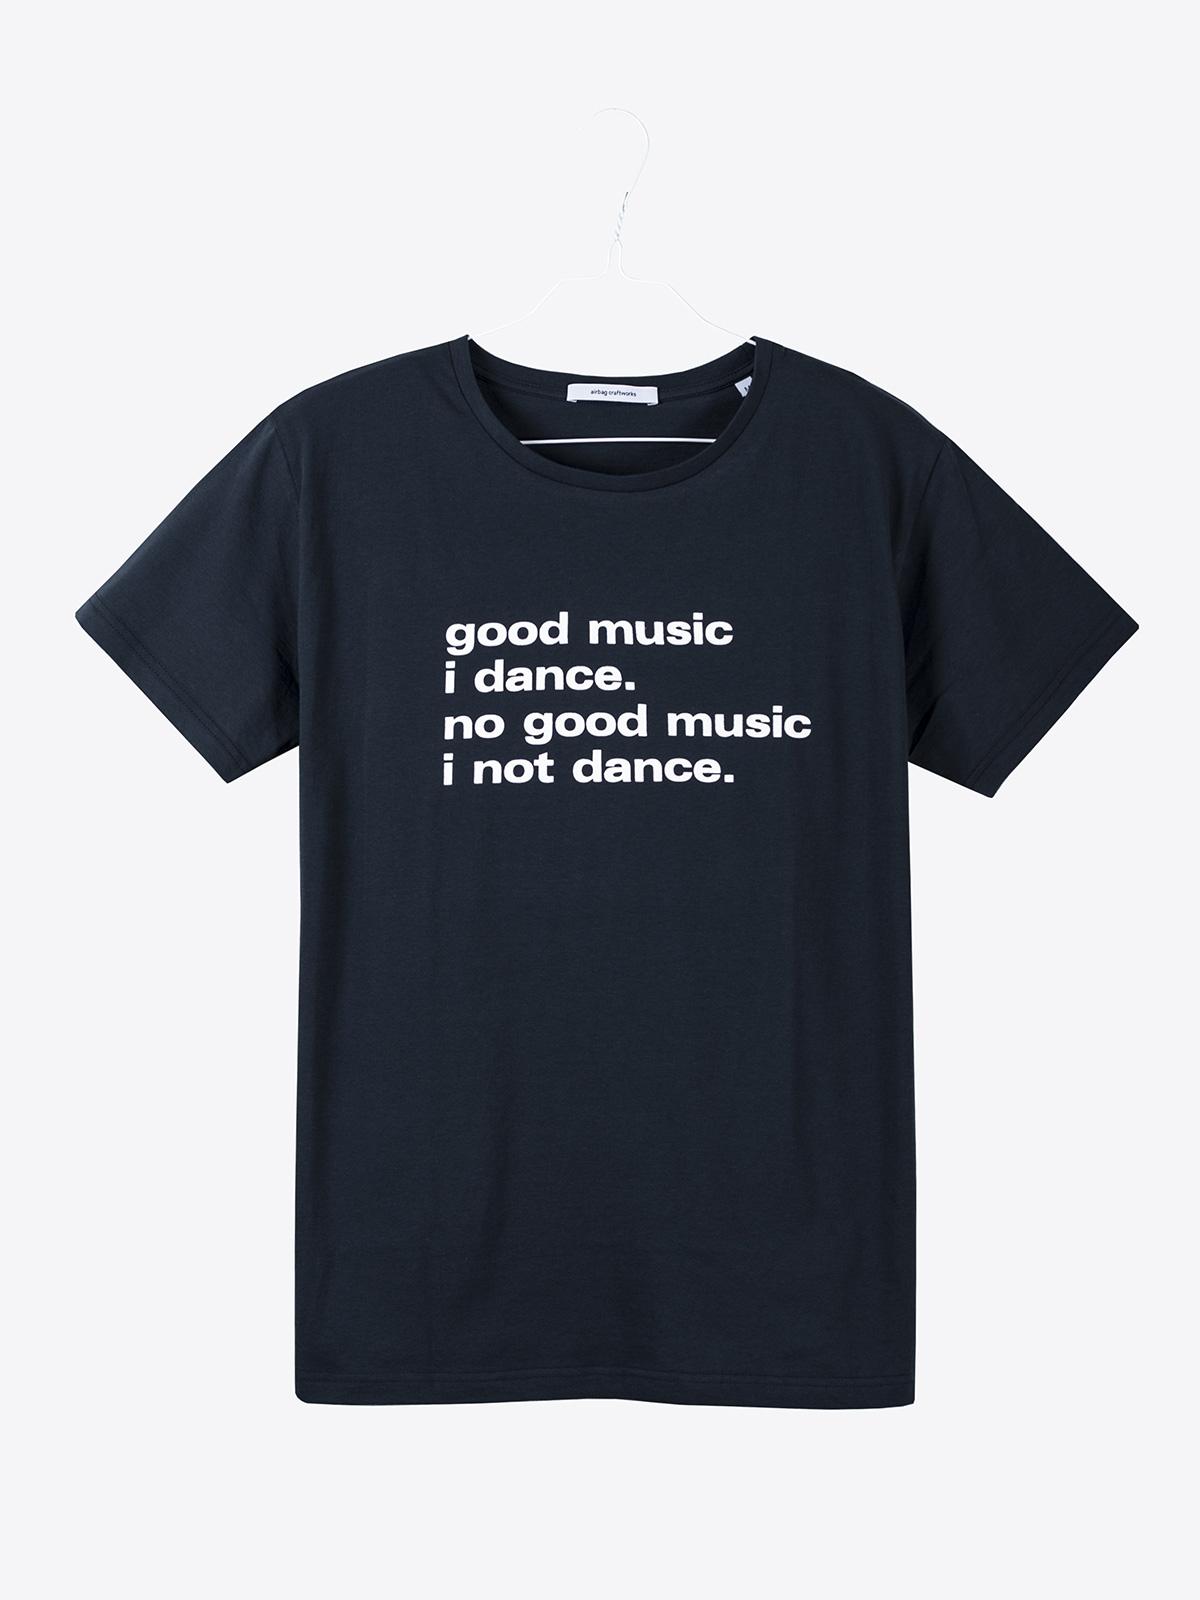 airbag craftworks good music i dance | dark navy